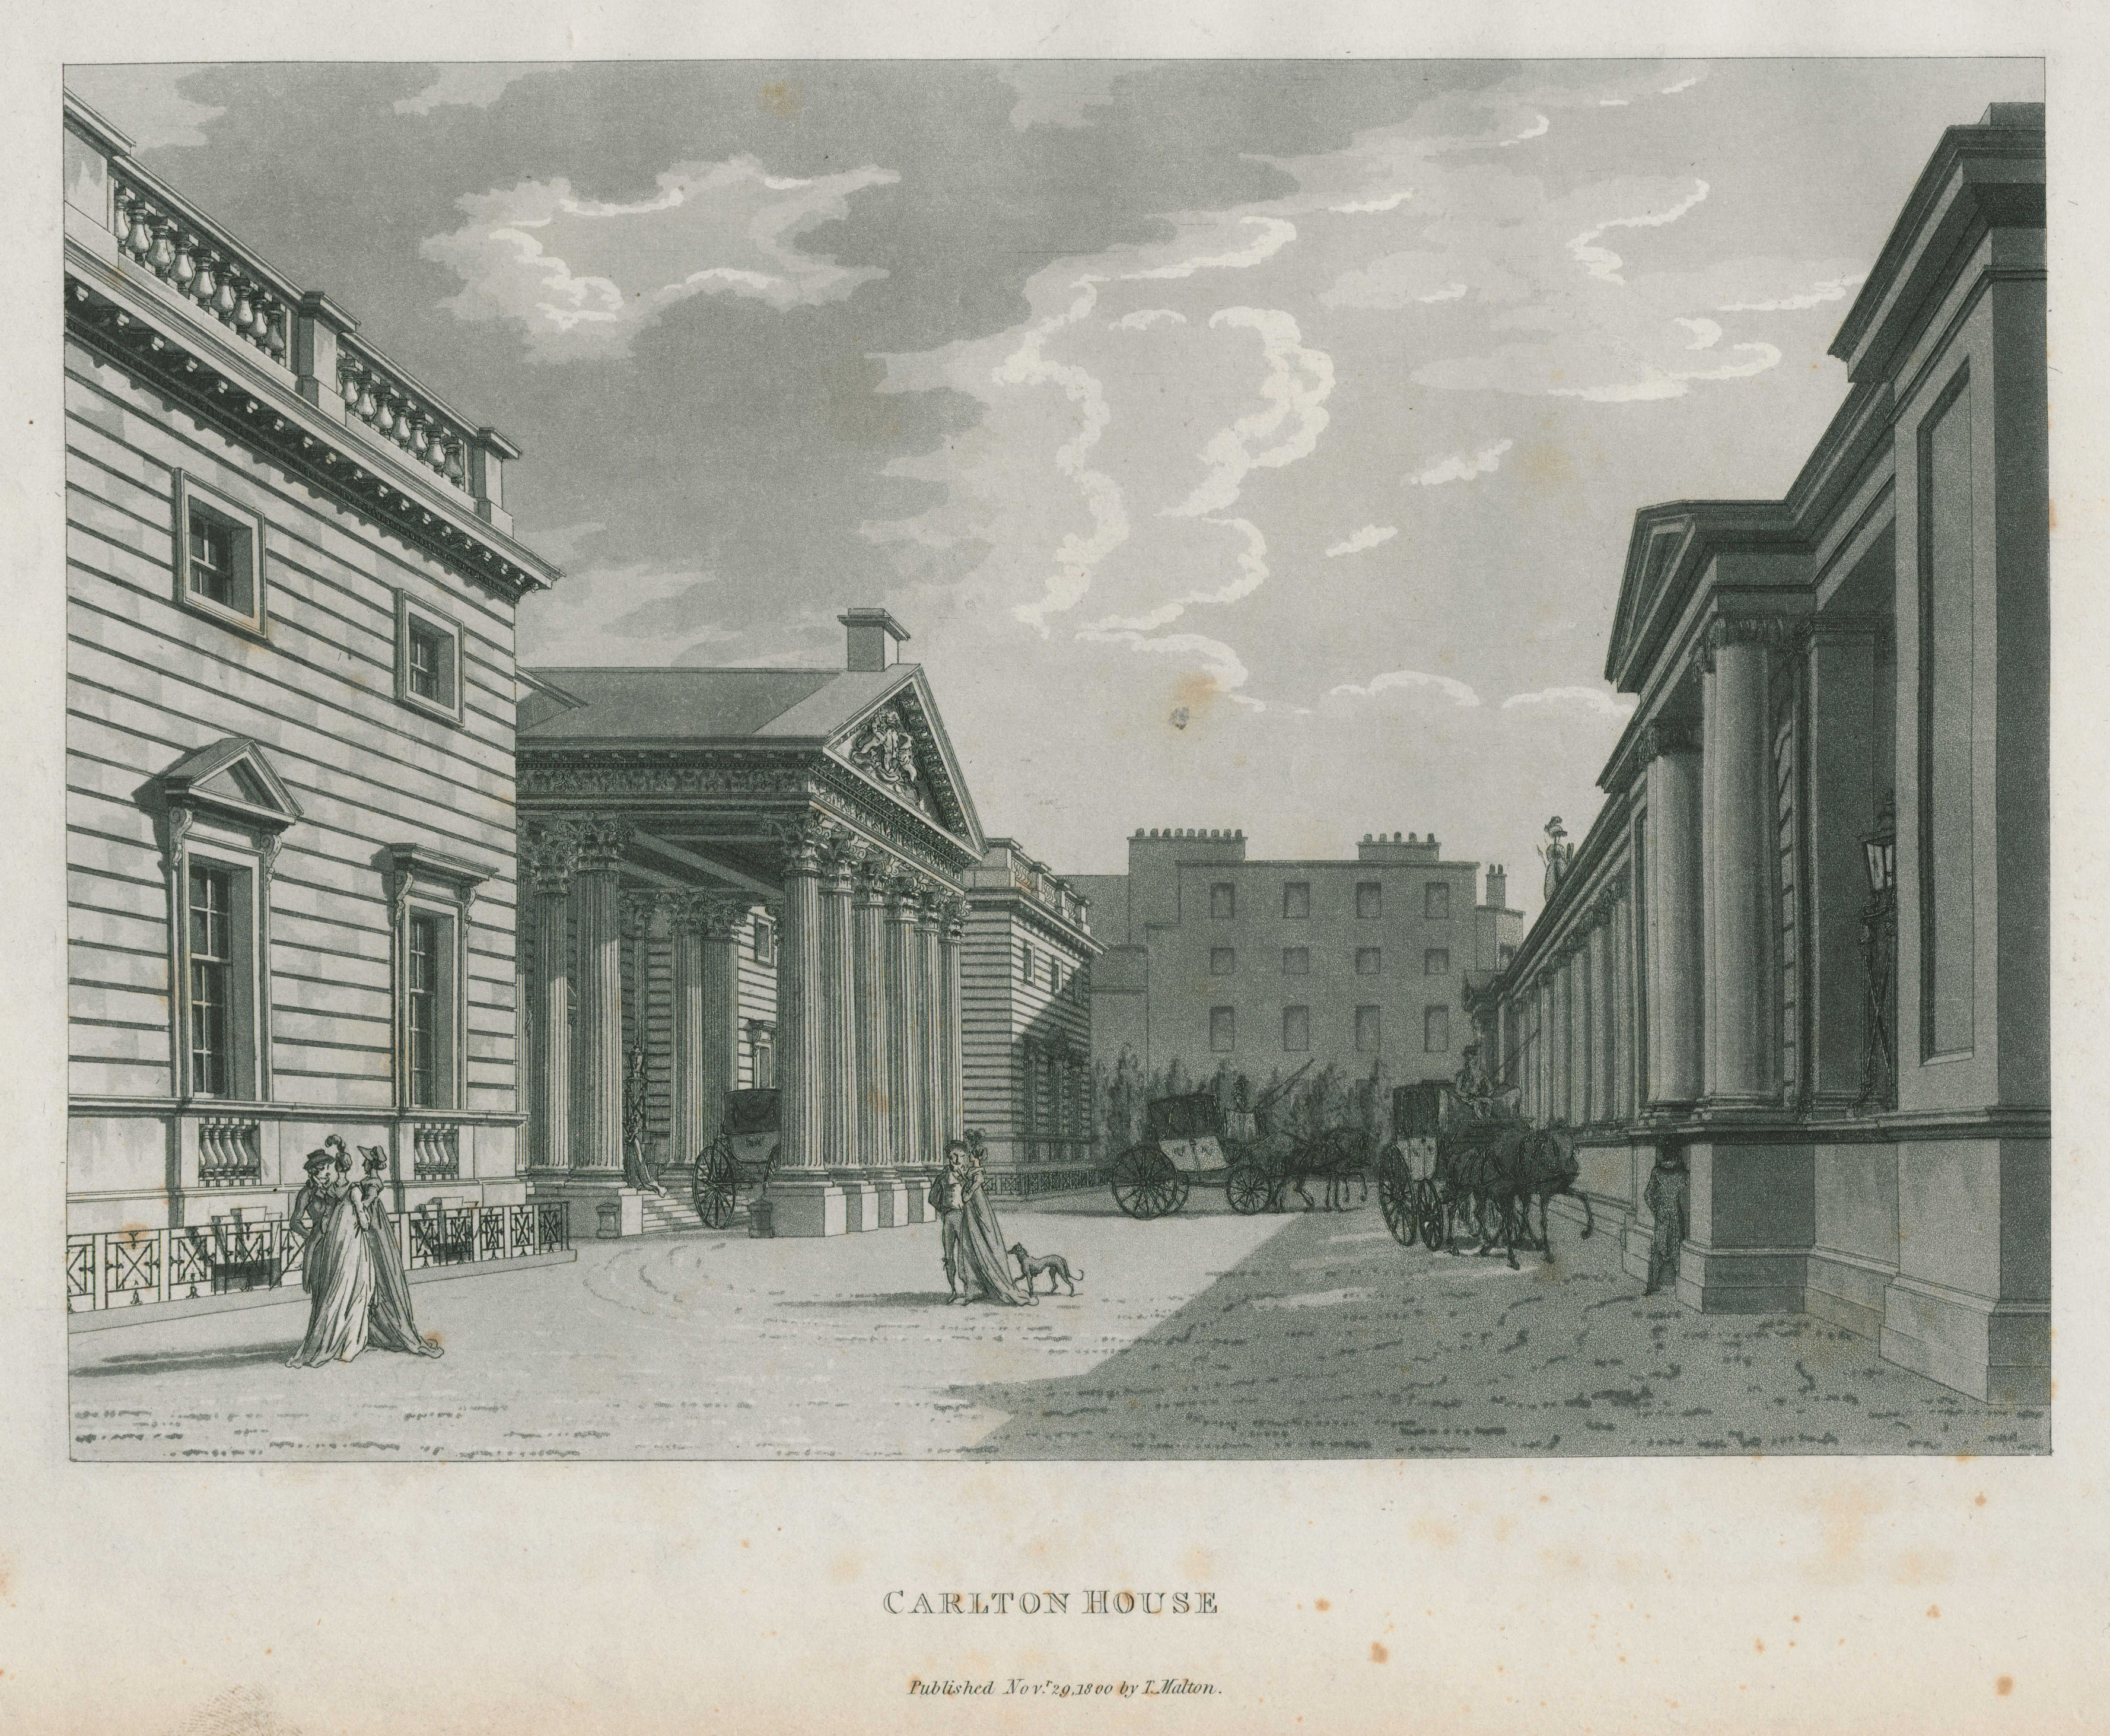 099 - Malton - Carlton House